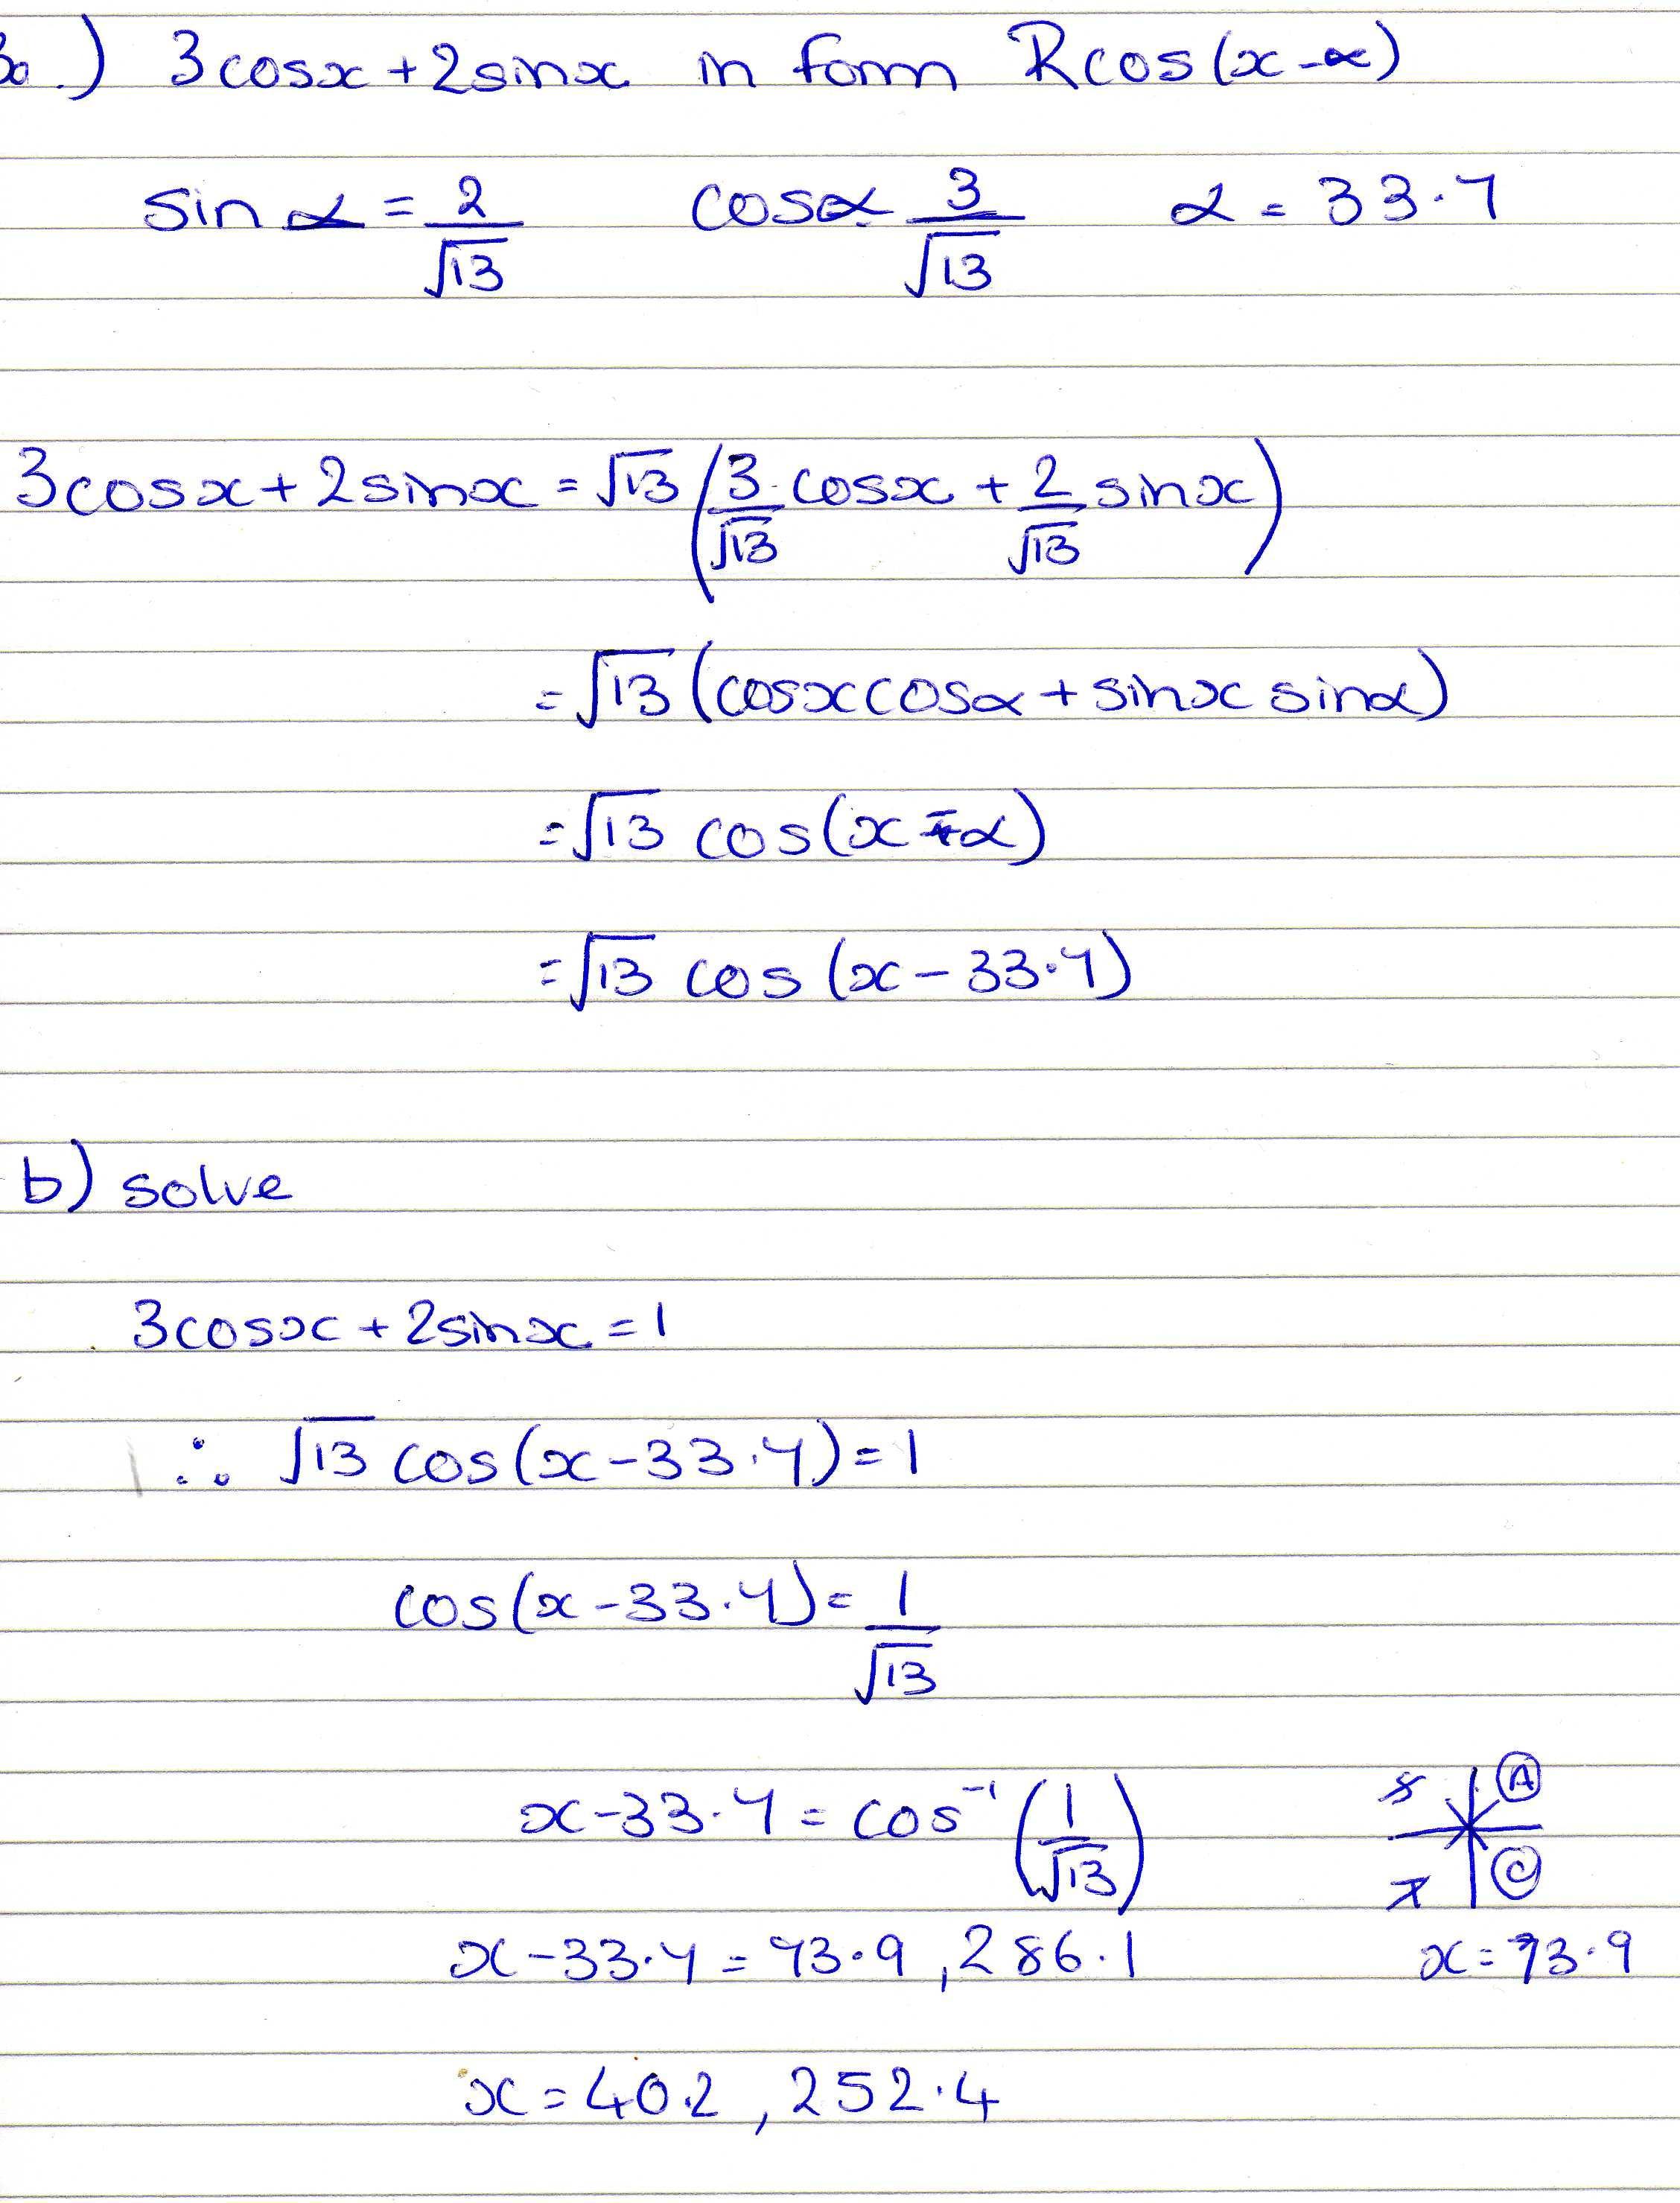 mathematics hl paper 2 tz1 may Mathematics sl - may 2012 - paper 2 tz2 2012apdf mon, 30  papers 1 & 2, and hl papers 1 &  download books mathematics sl paper 2 tz1 m08 ,.